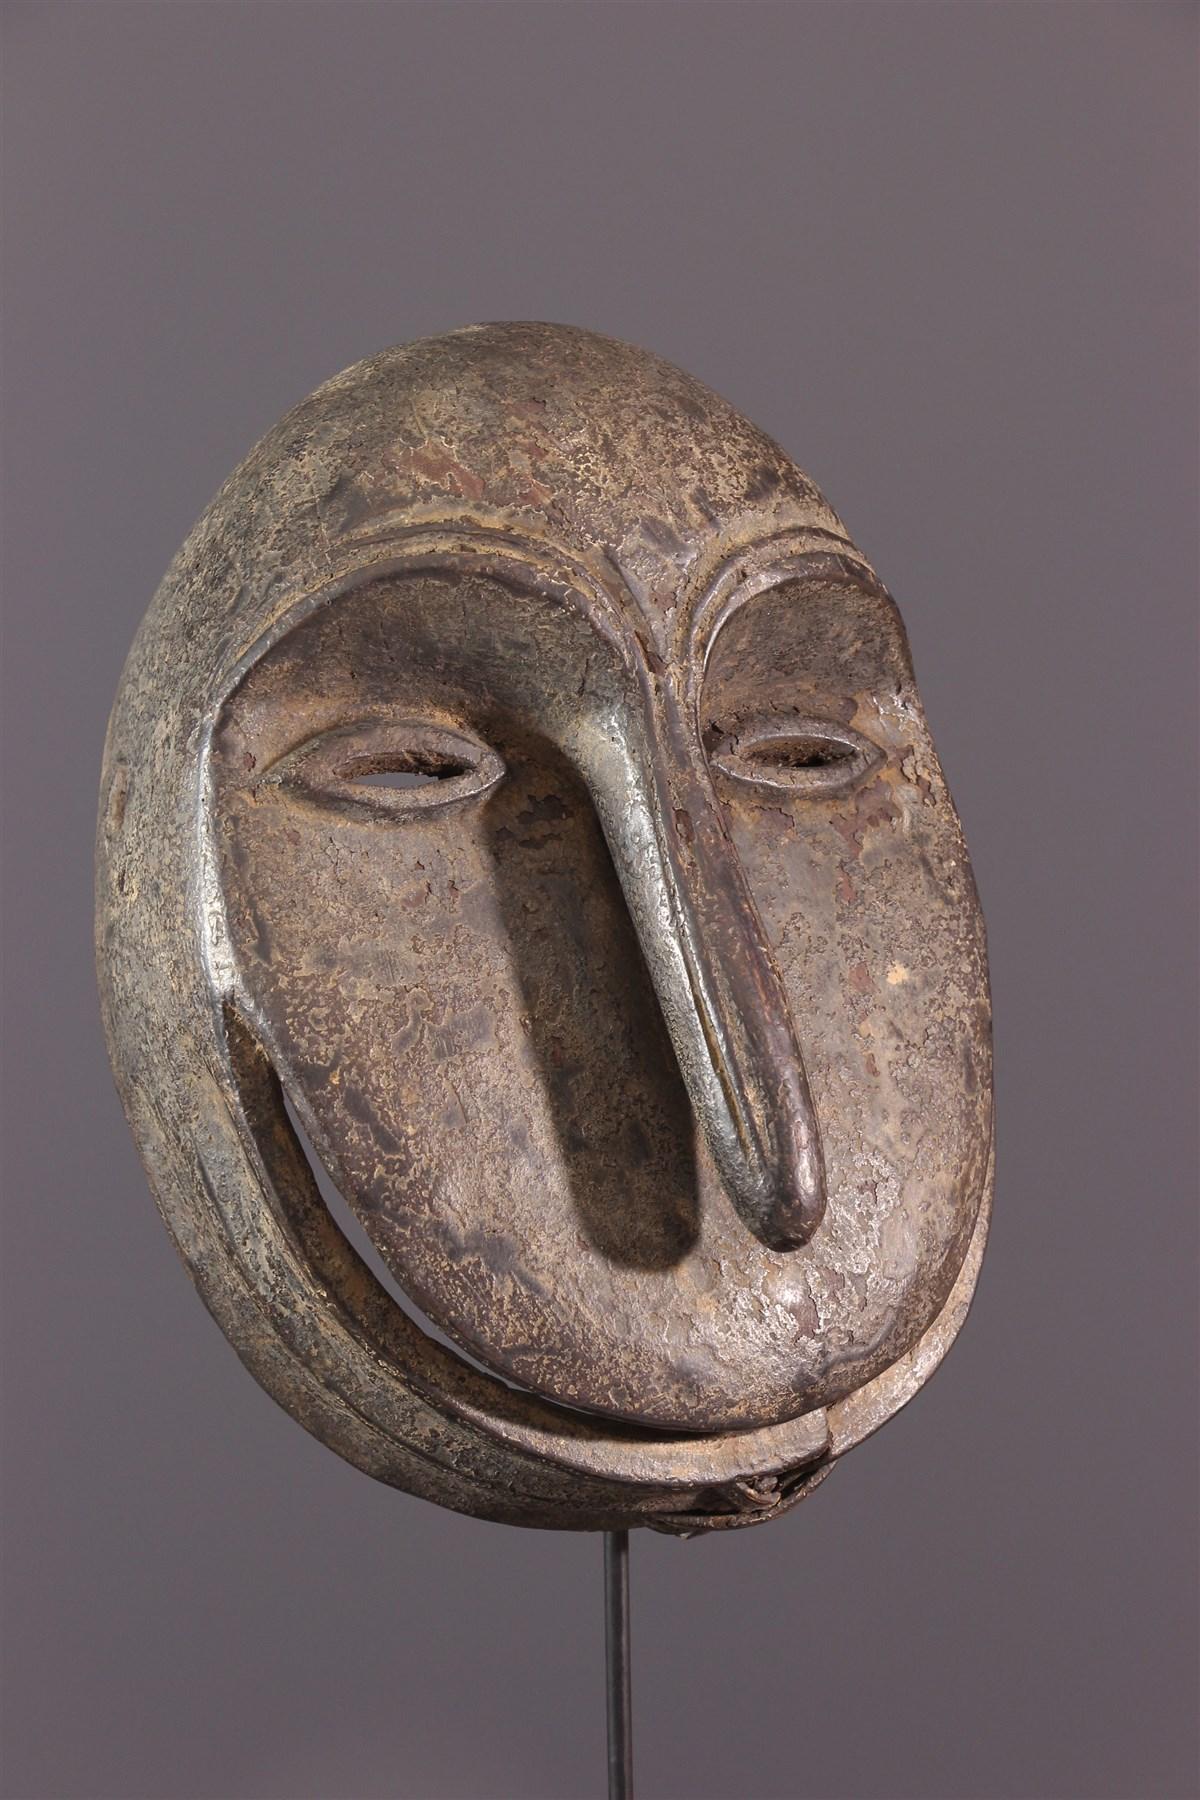 Masque Soko mutu Hemba simiesque - Art africain